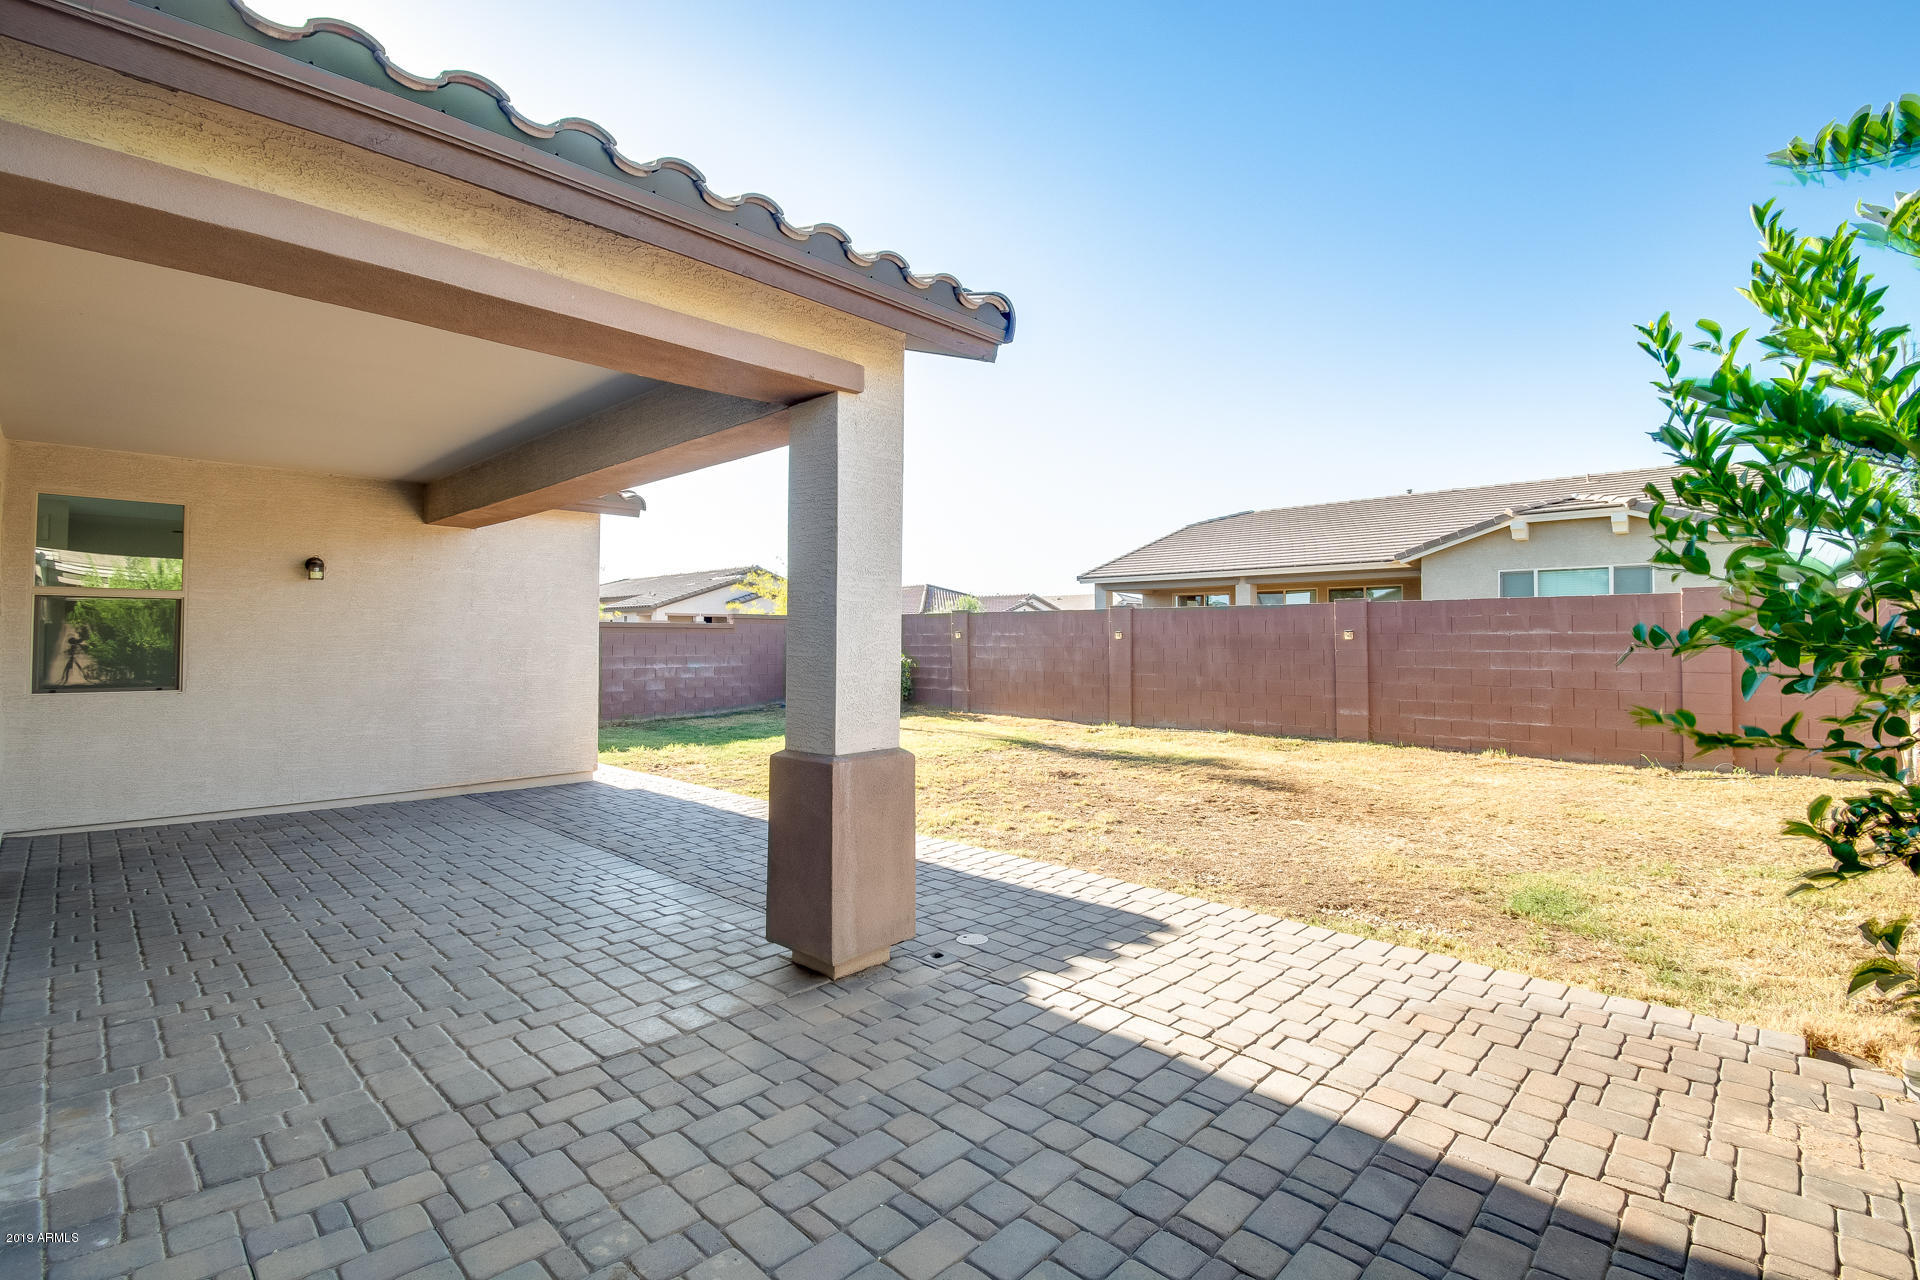 MLS 5964876 212 W EVERGREEN PEAR Avenue, San Tan Valley, AZ 85140 San Tan Valley AZ Three Bedroom